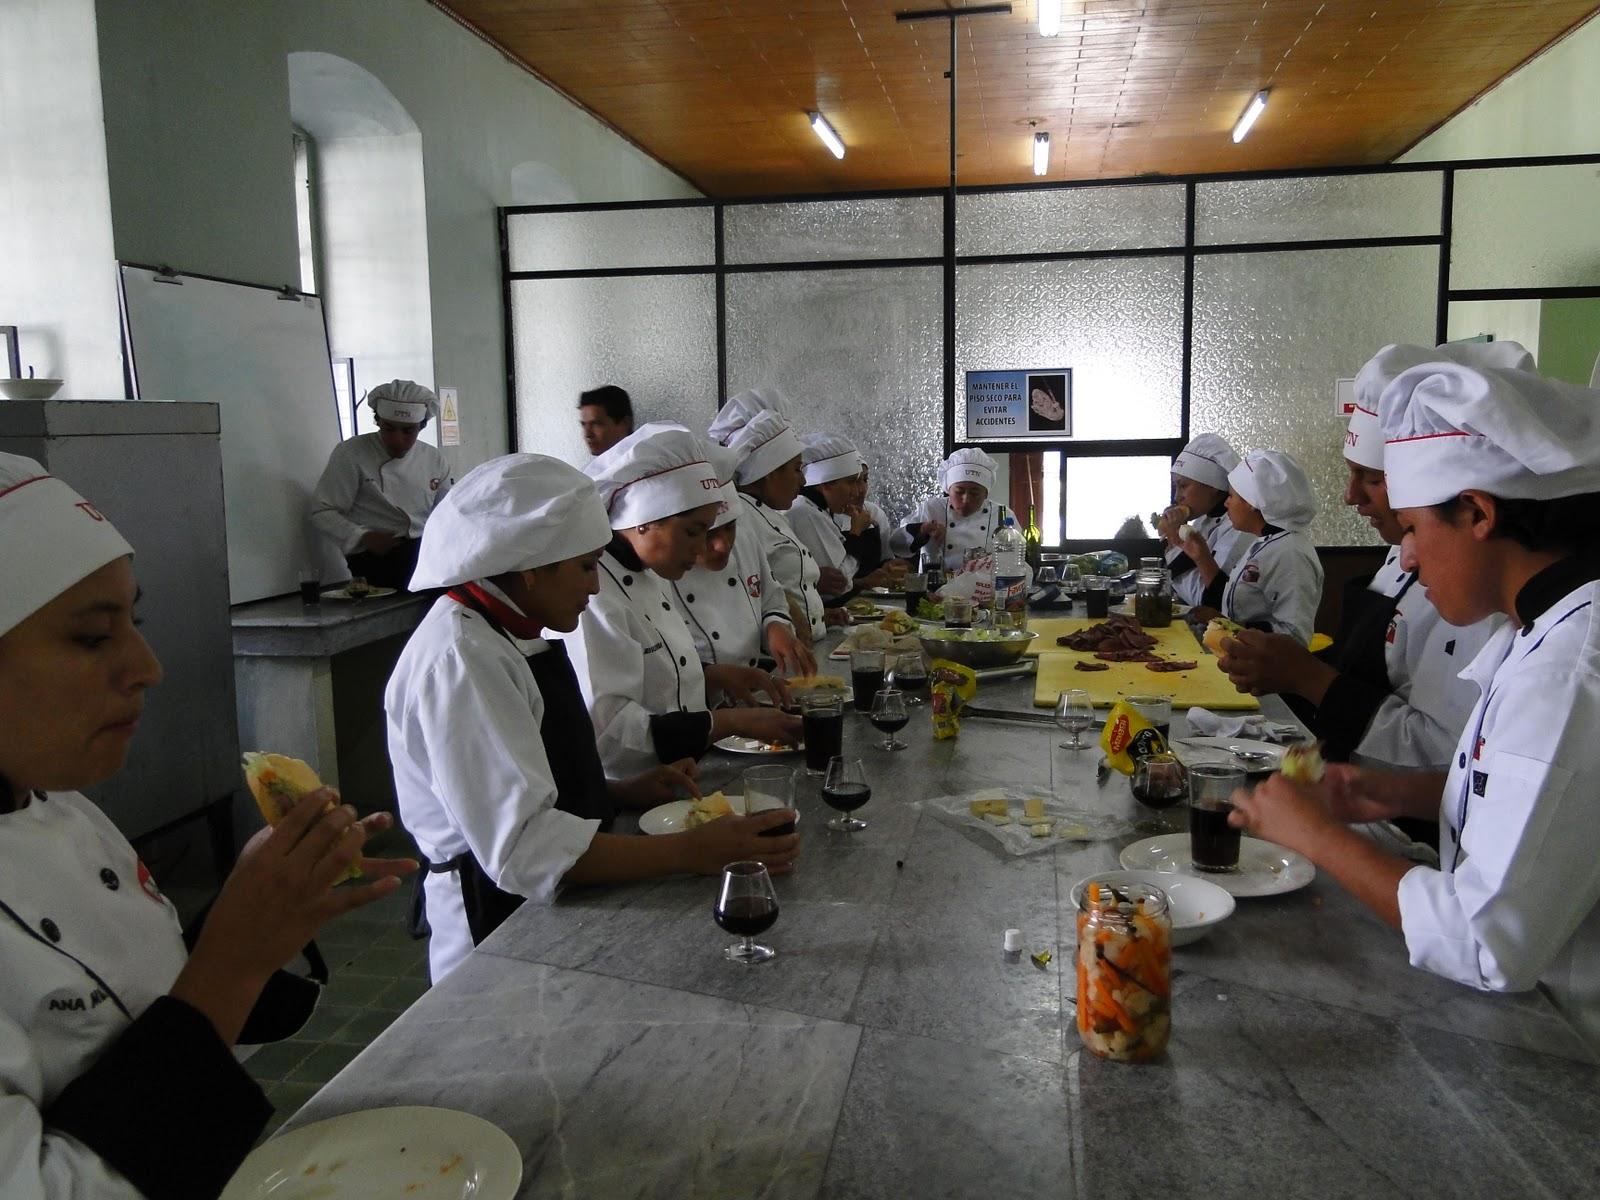 Garde manger pastrami for Deconstruccion gastronomica